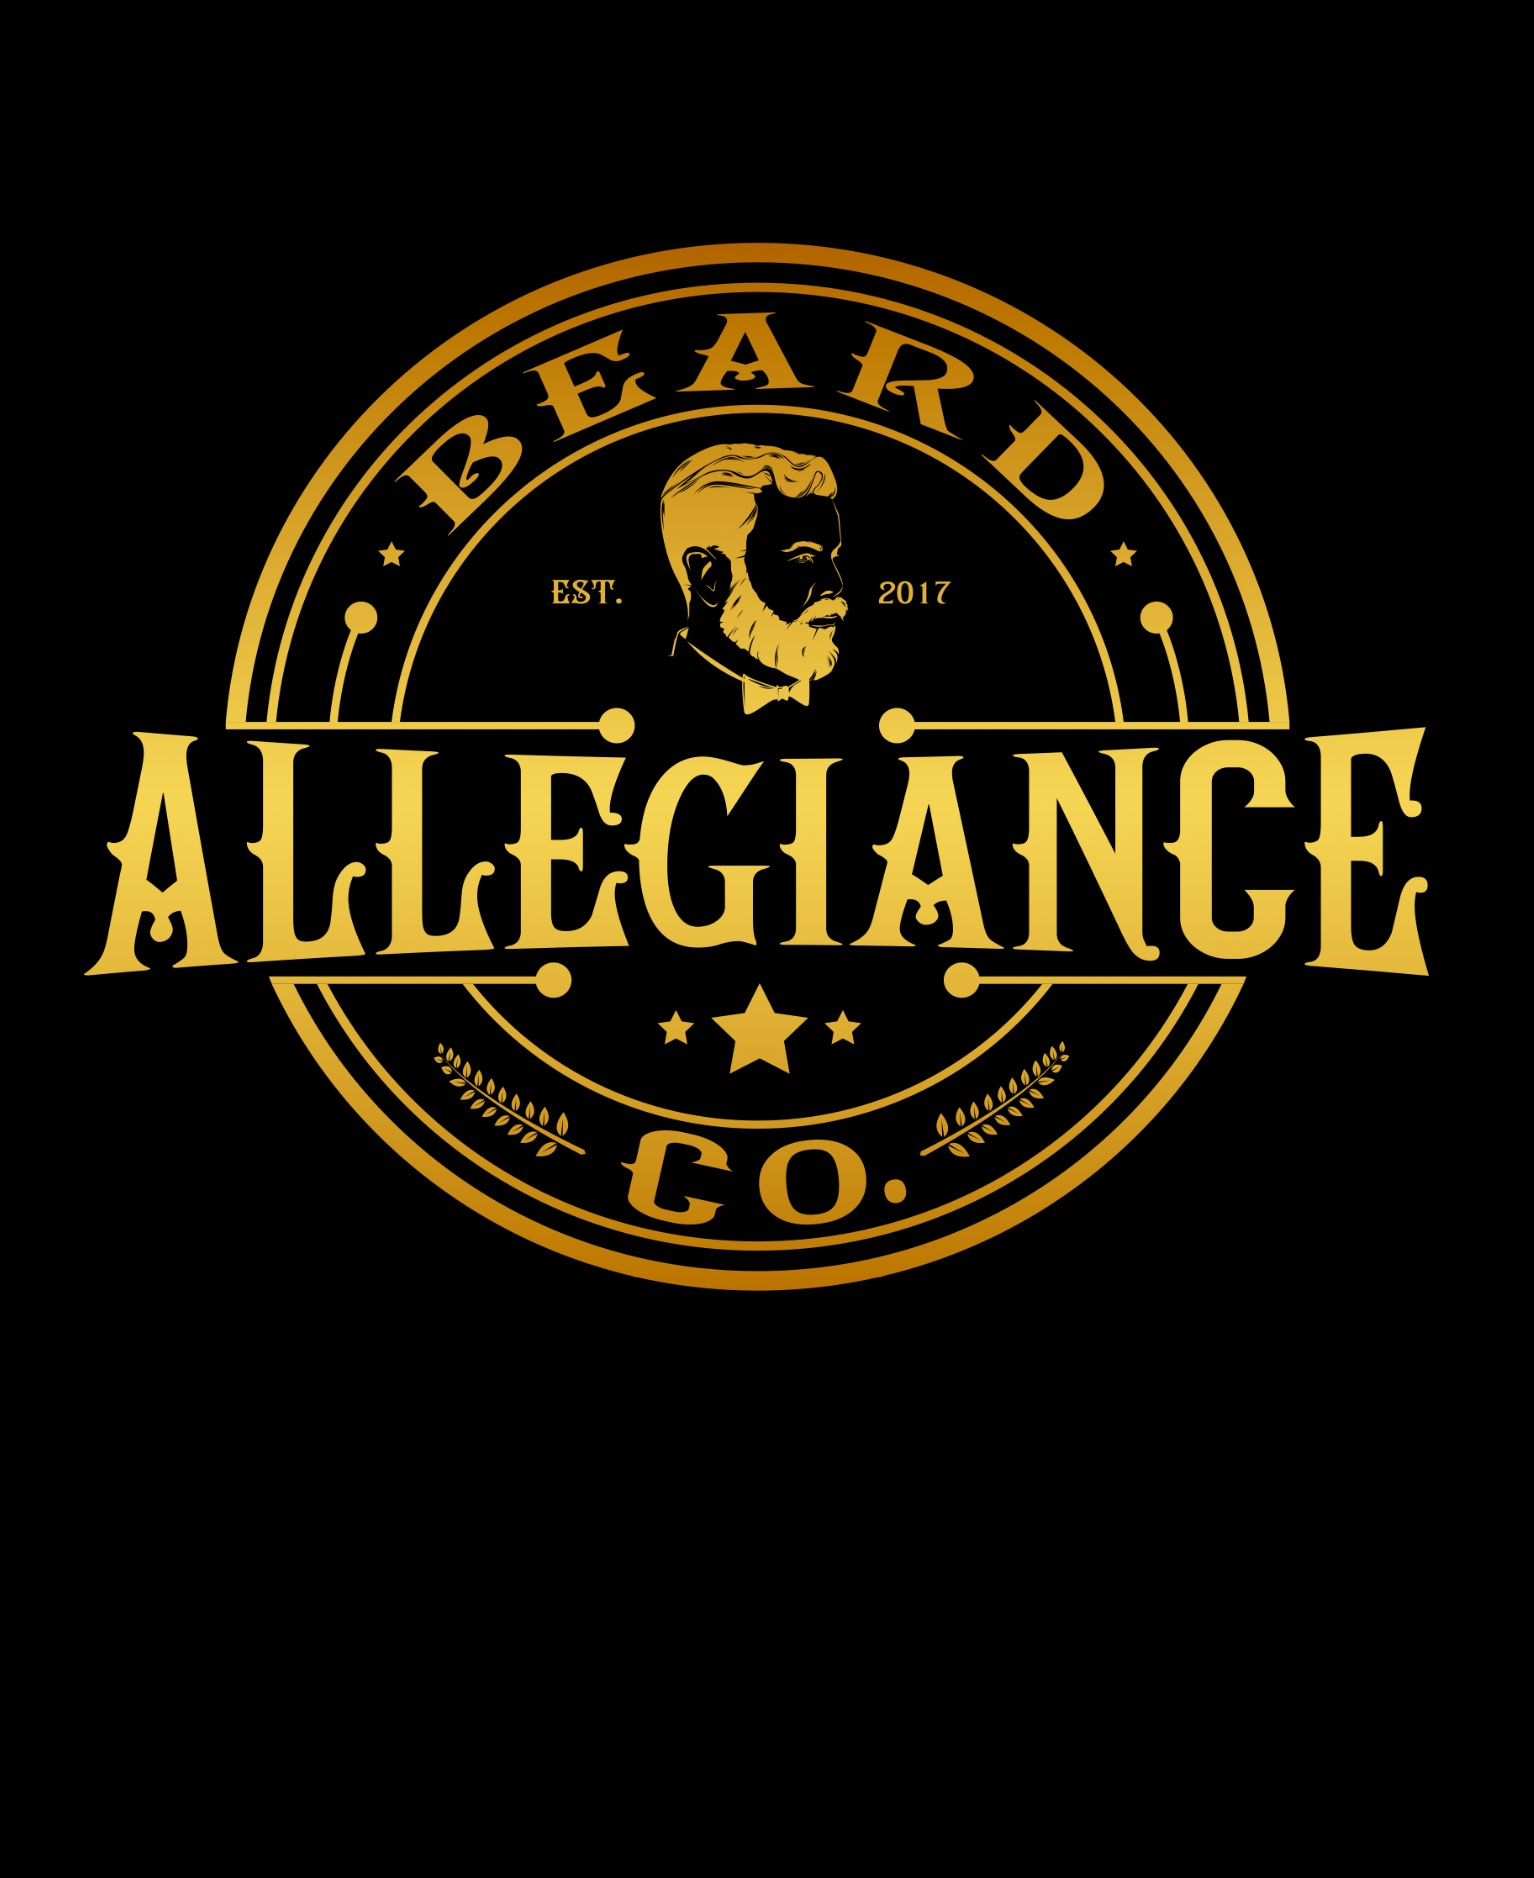 Allegiance Beard Co.